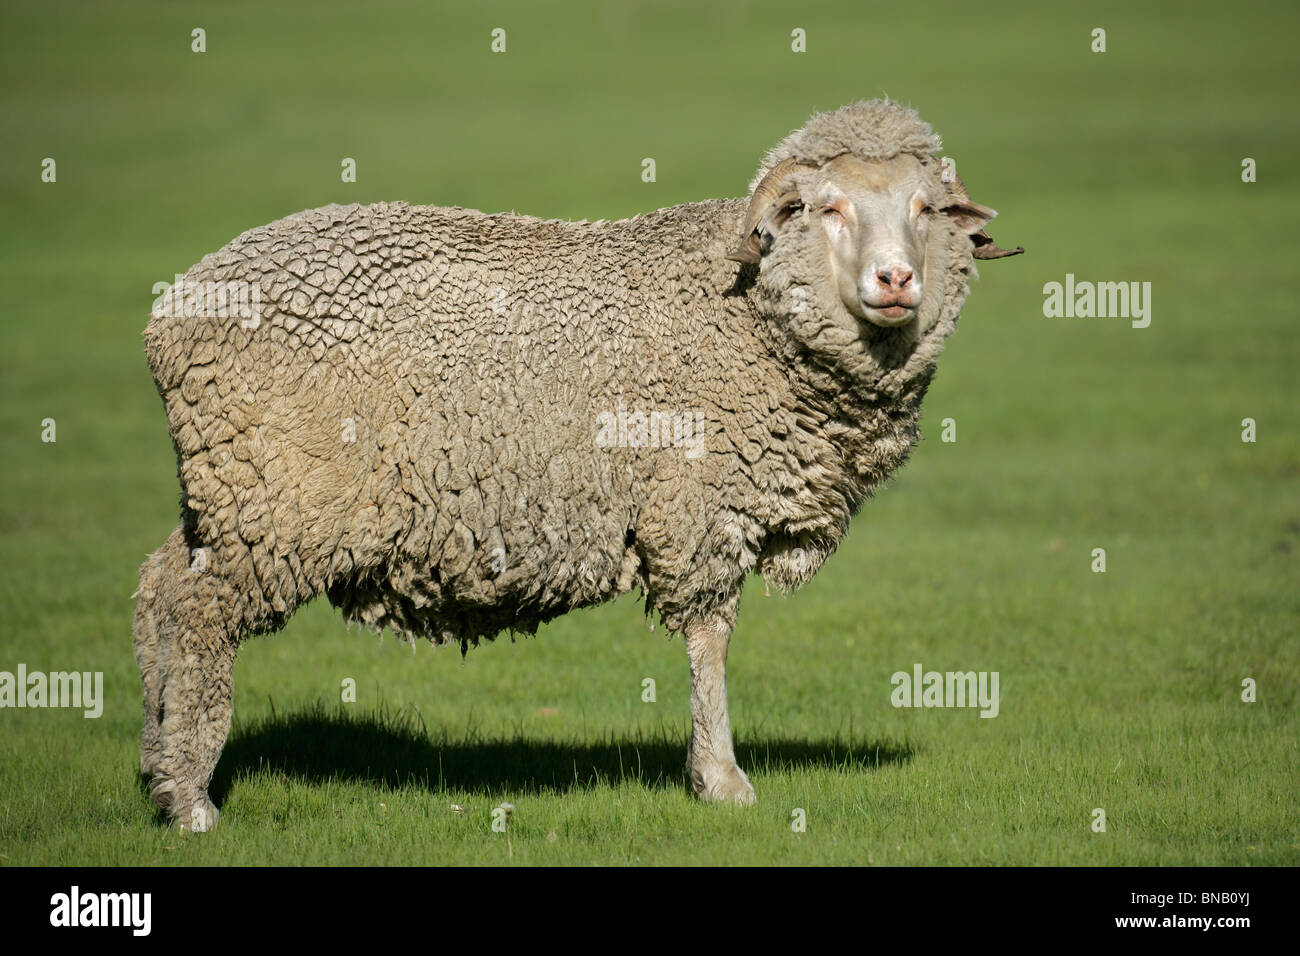 A merino sheep standing in lush green pasture - Stock Image